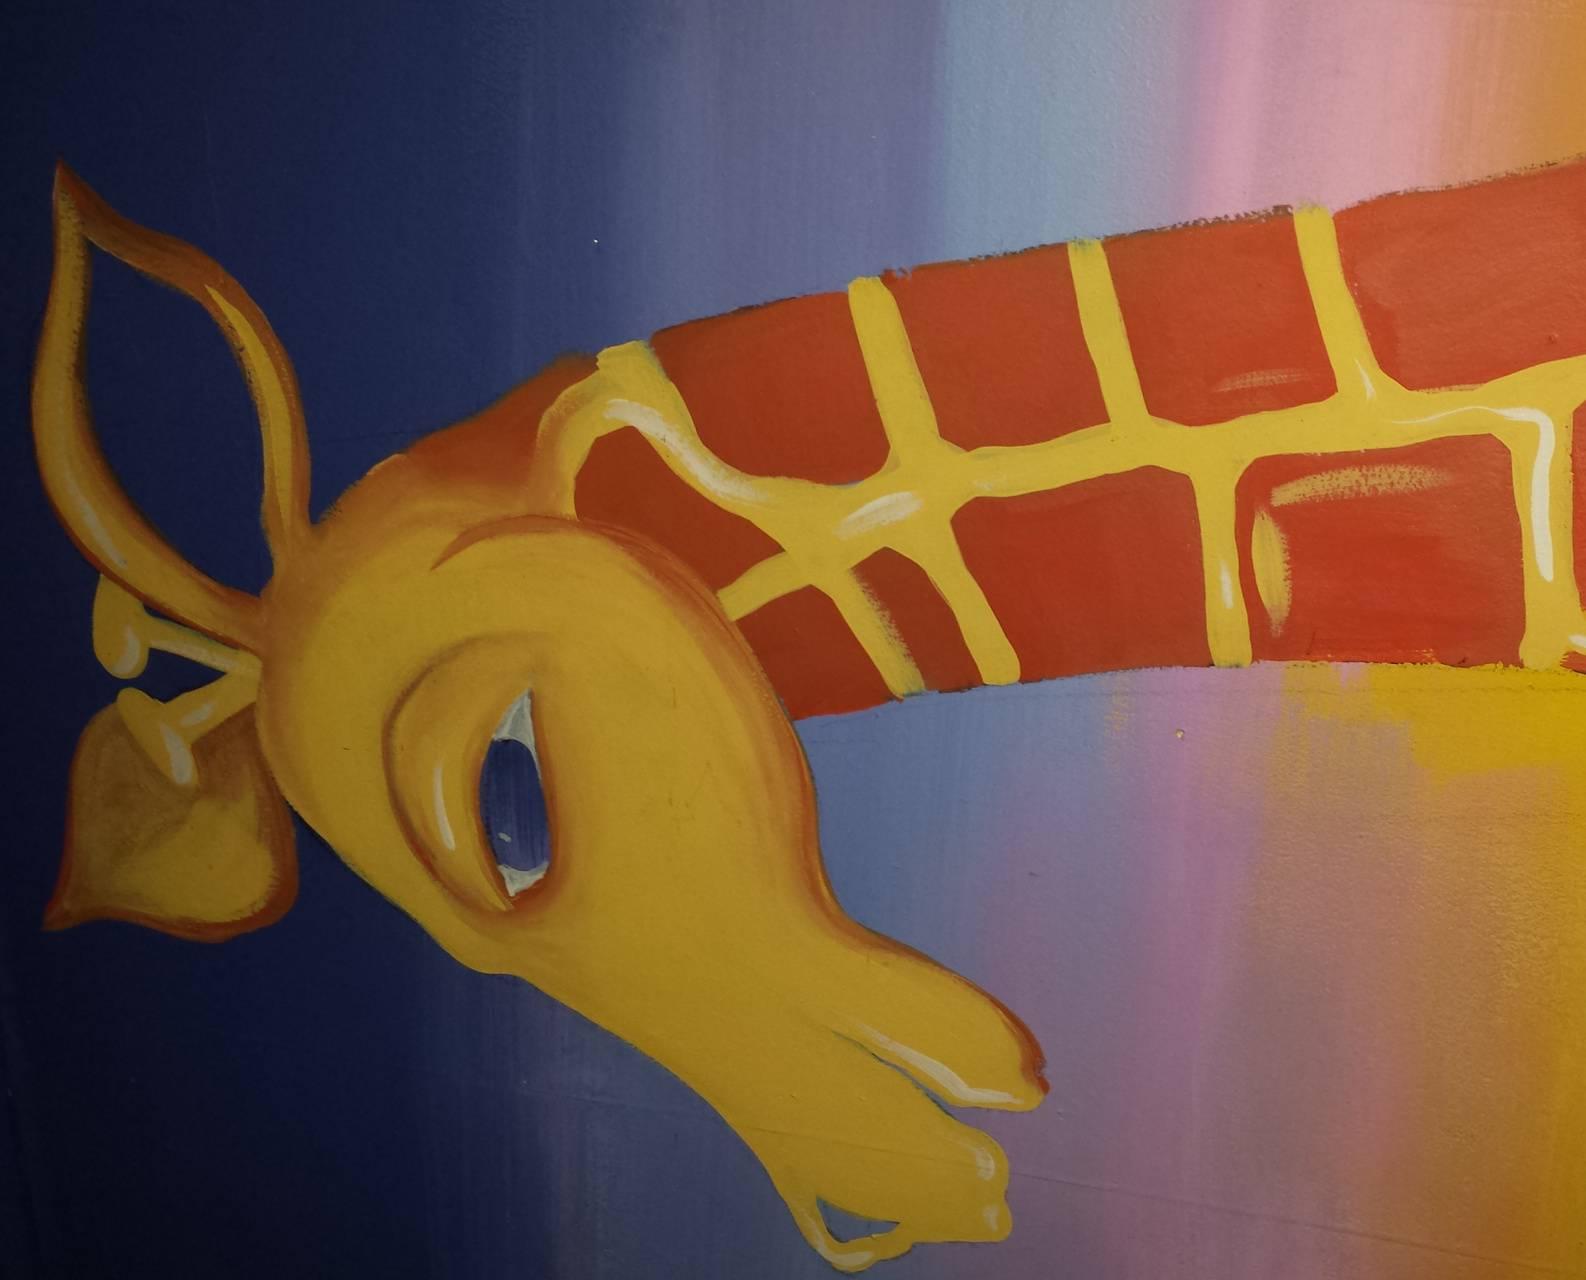 Gary the giraffe